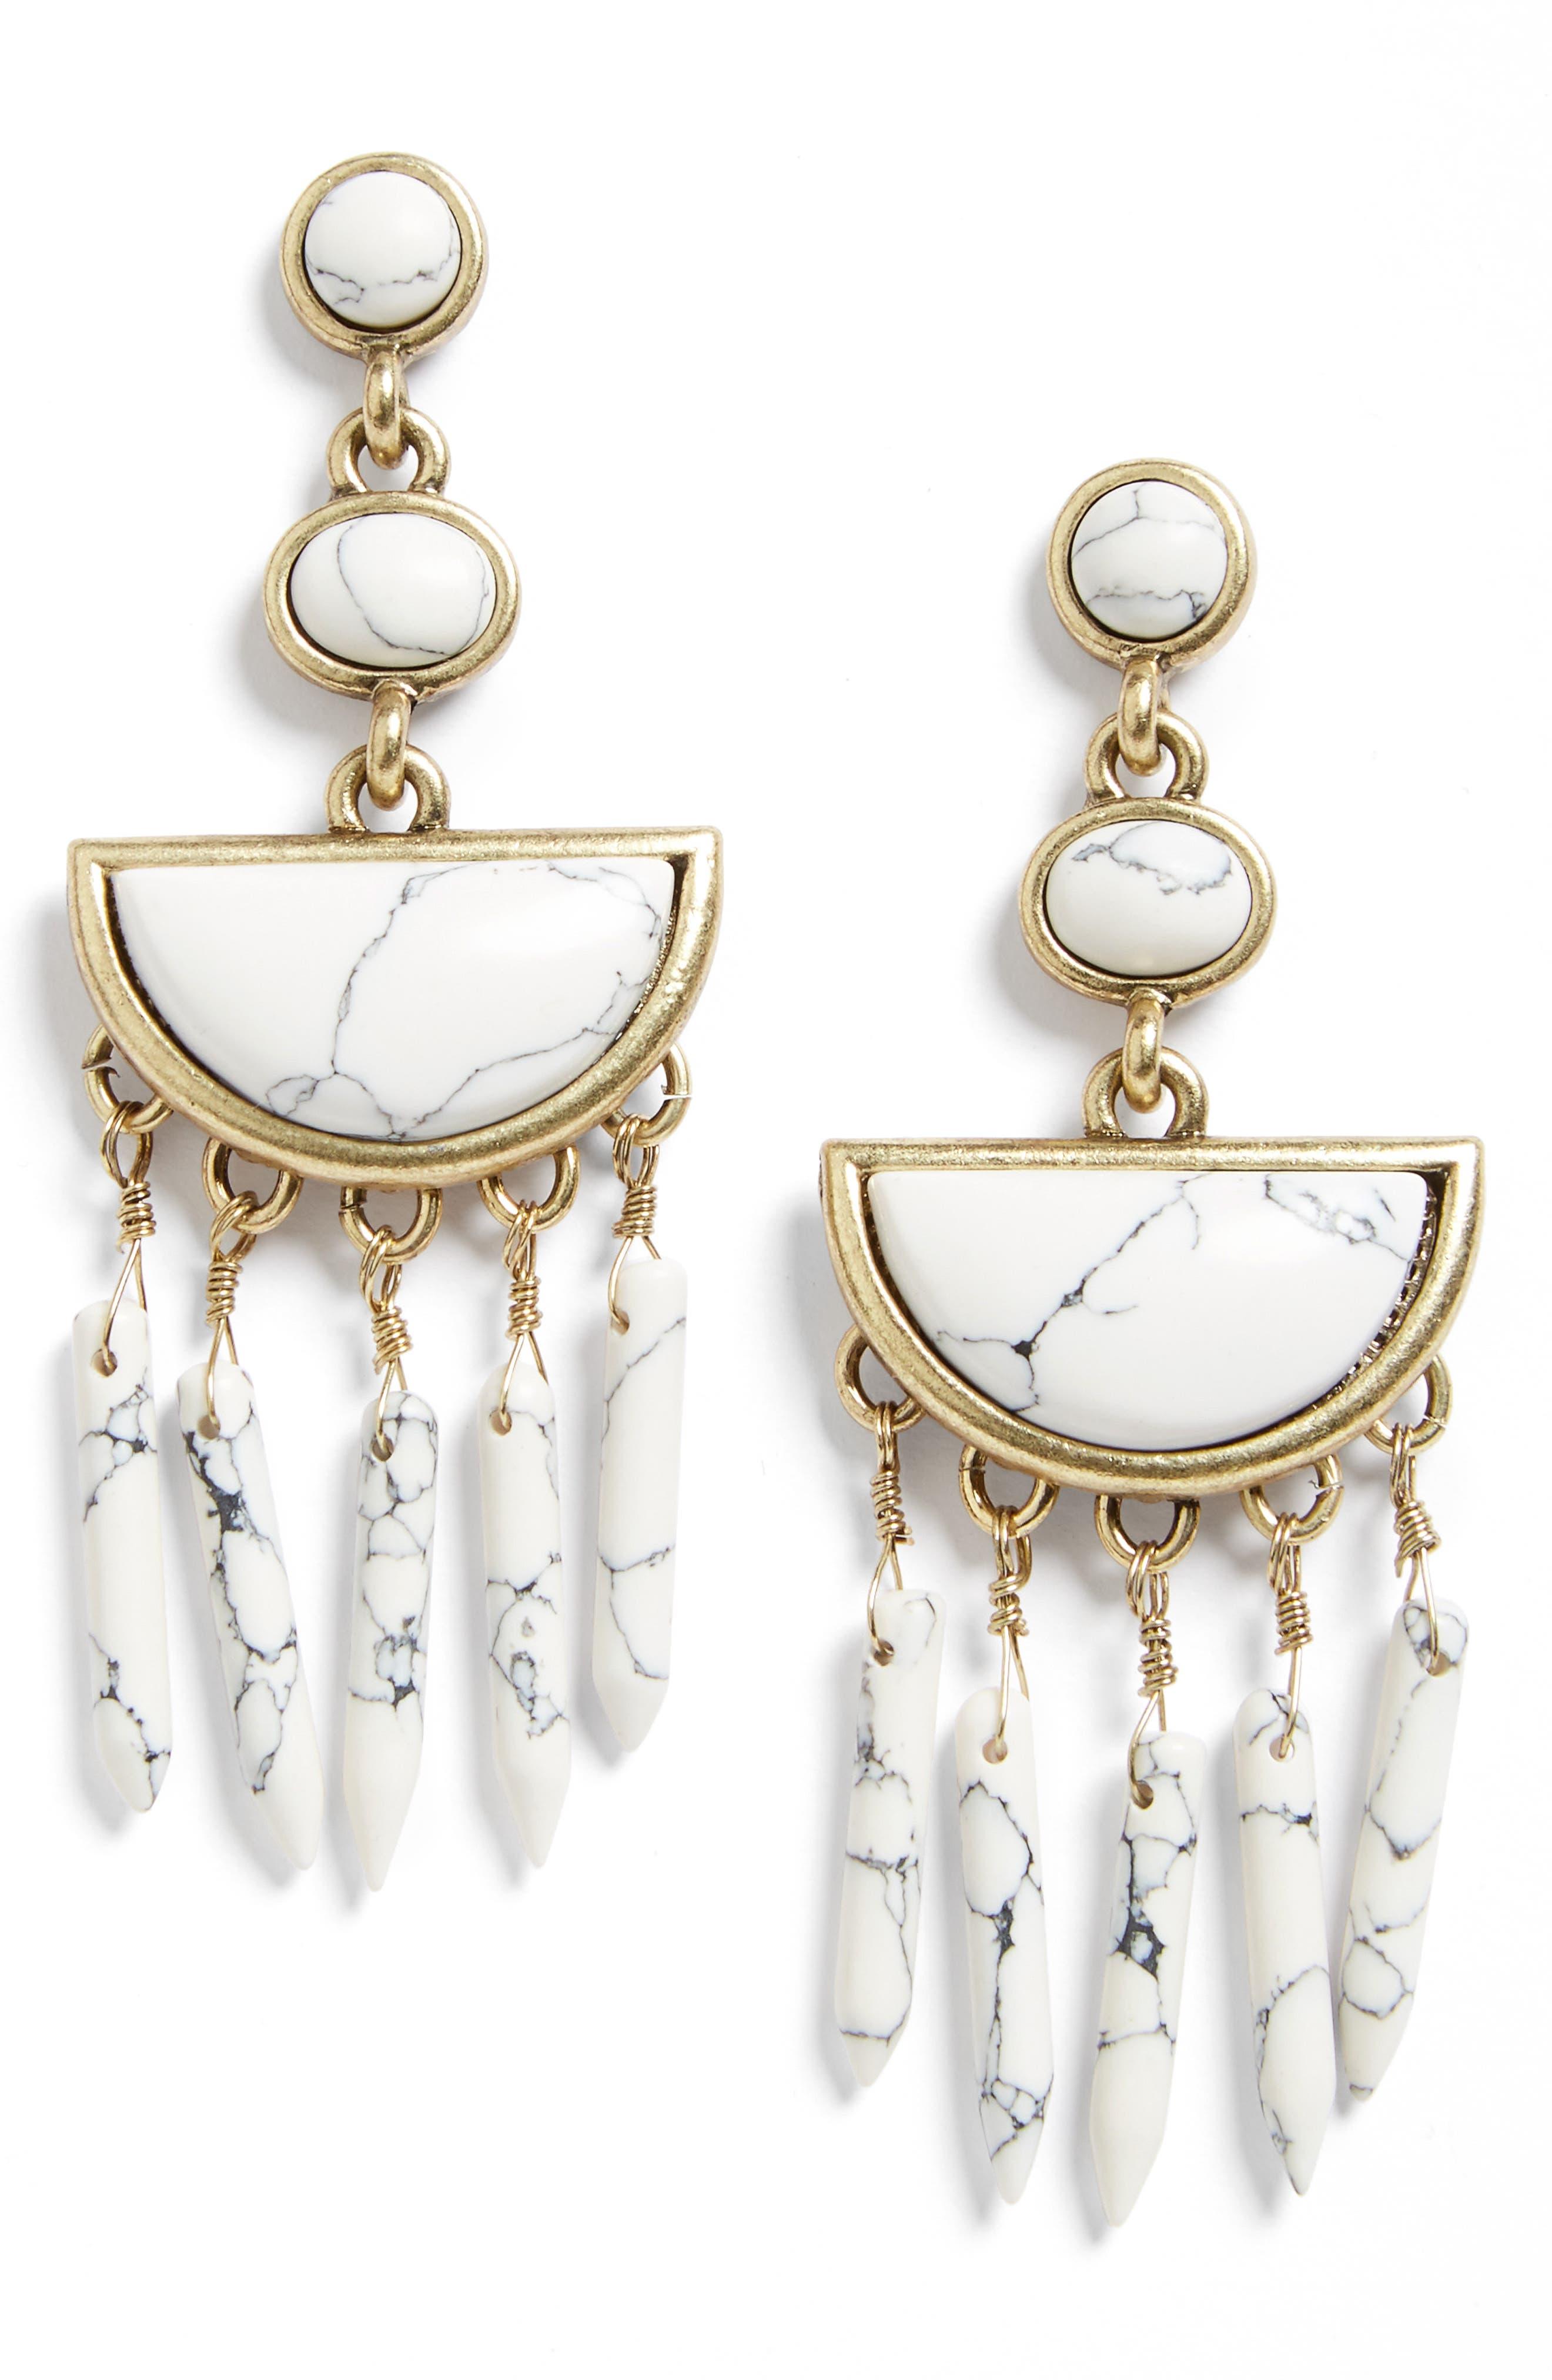 Main Image - BaubleBar Nora Drop Earrings